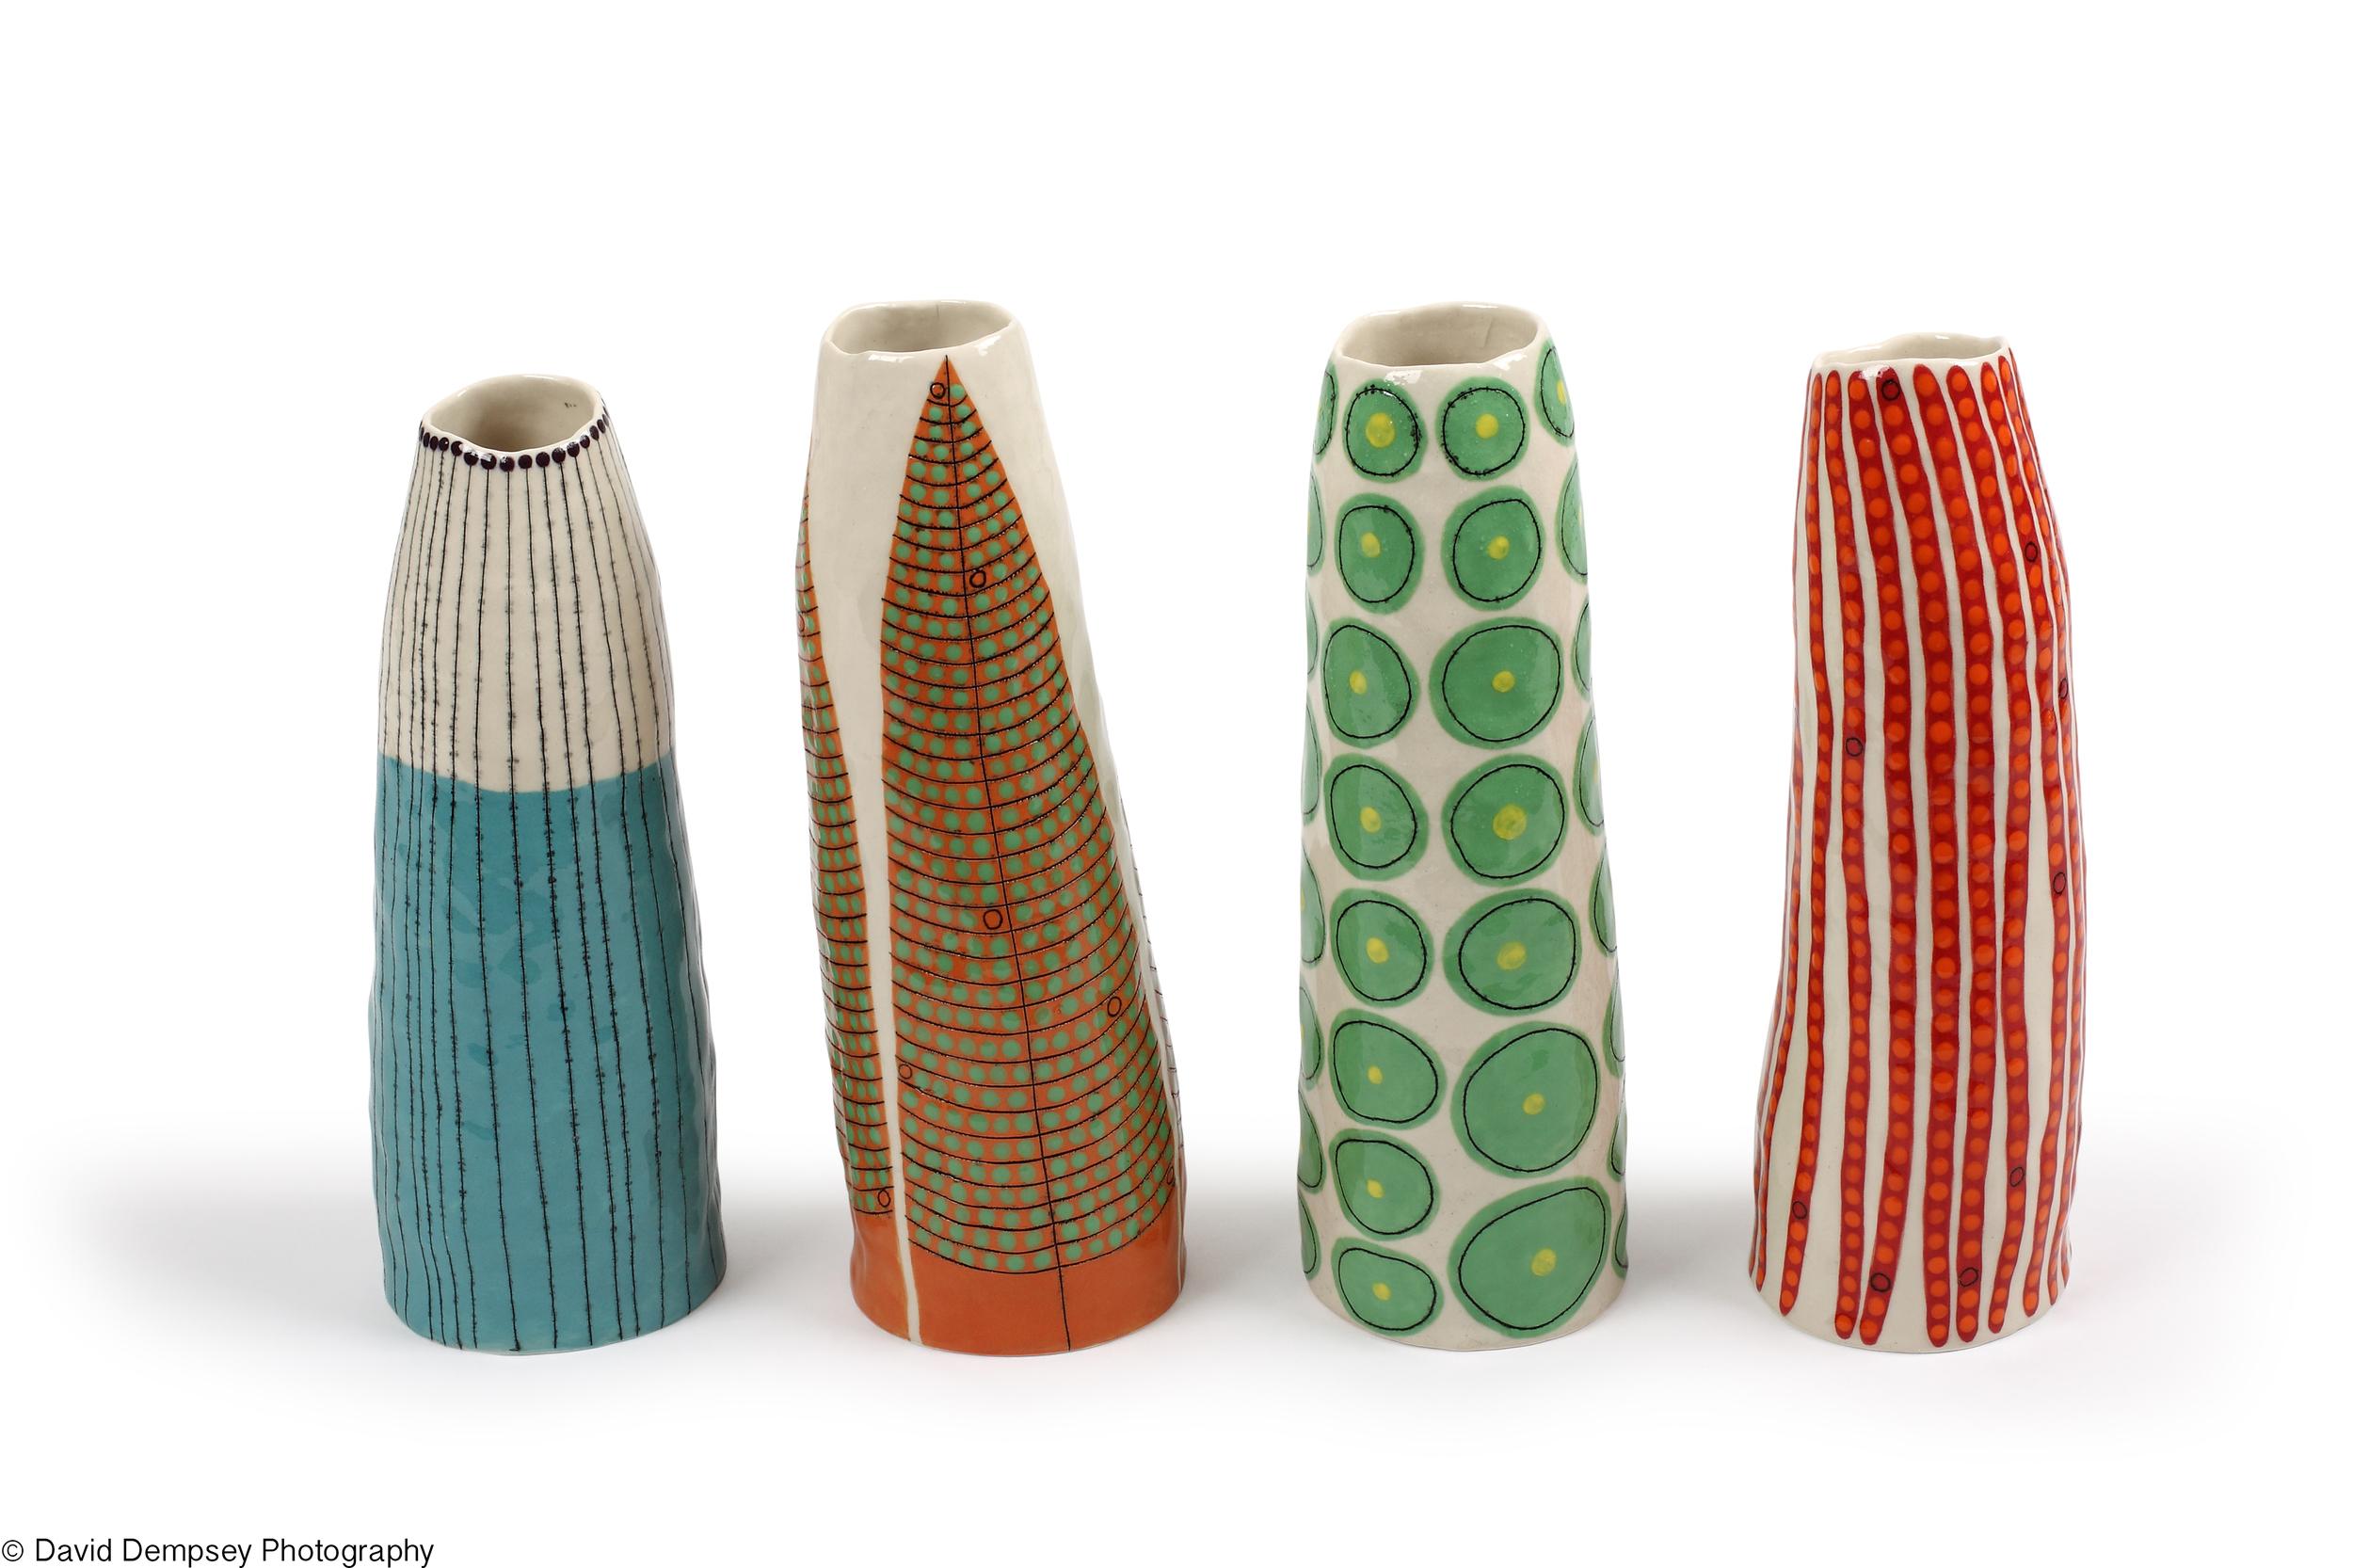 Vases by Andrew Ludick